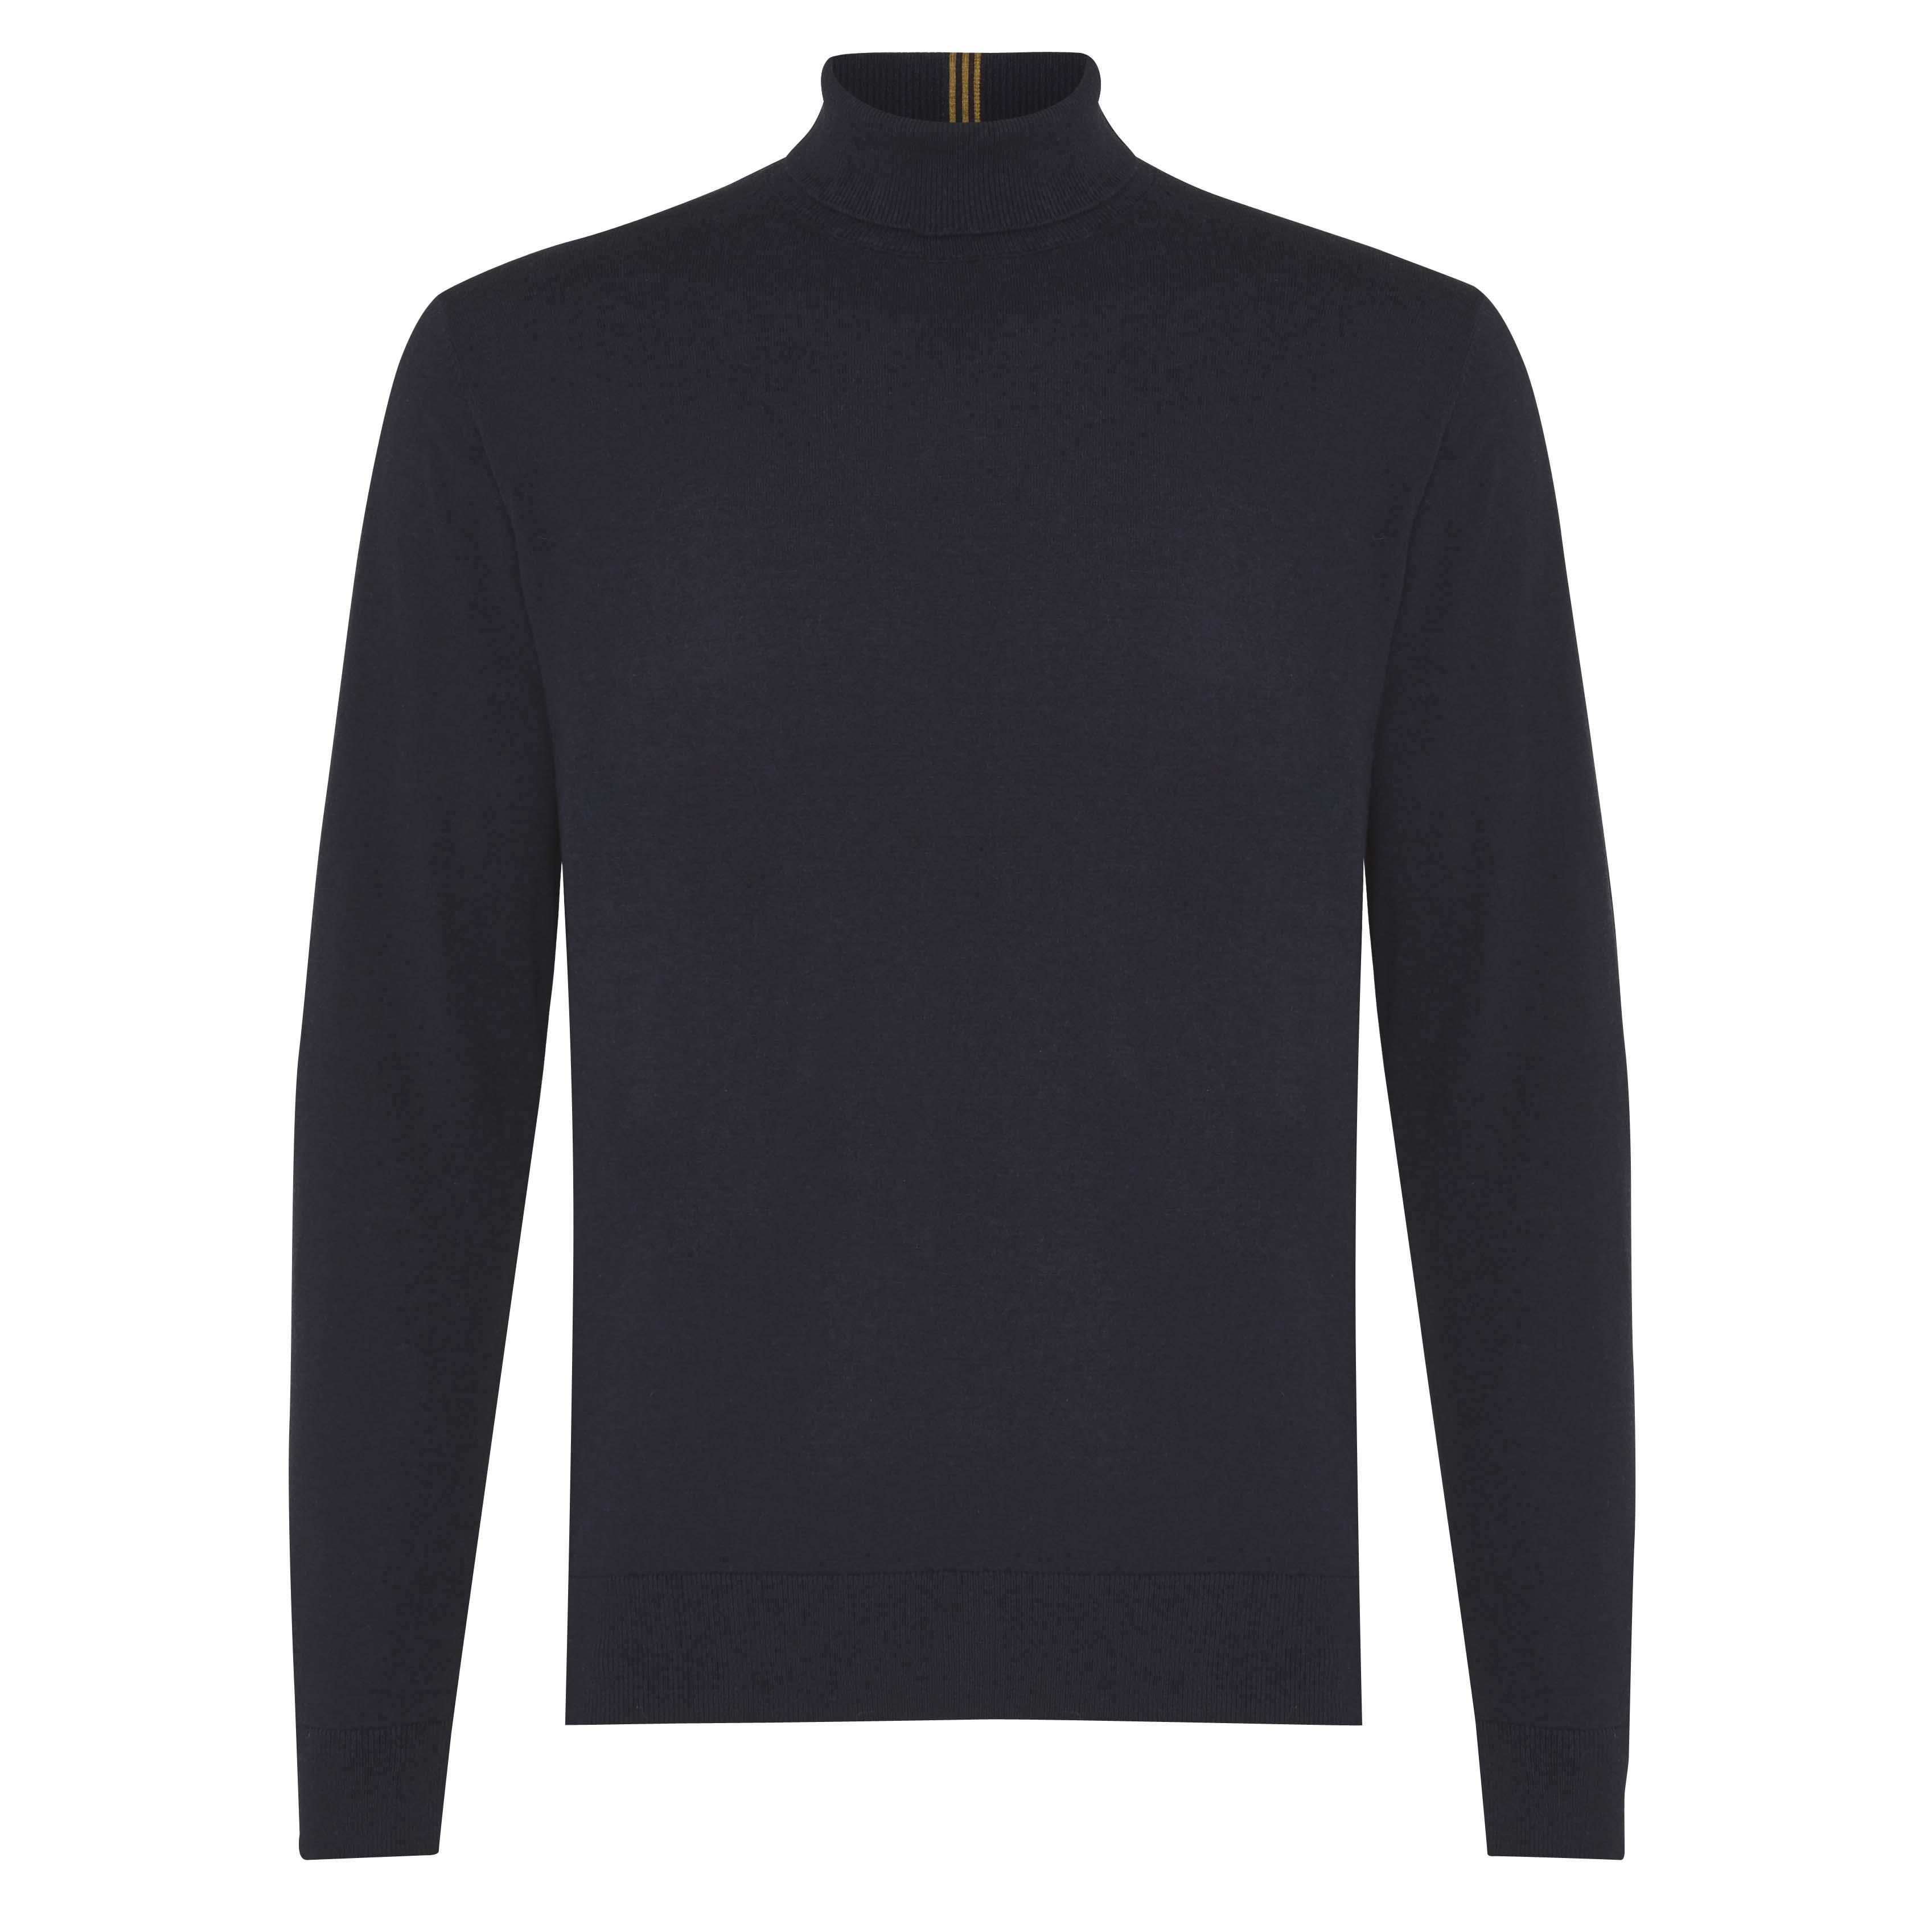 Jakob | Pullover turtleneck navy